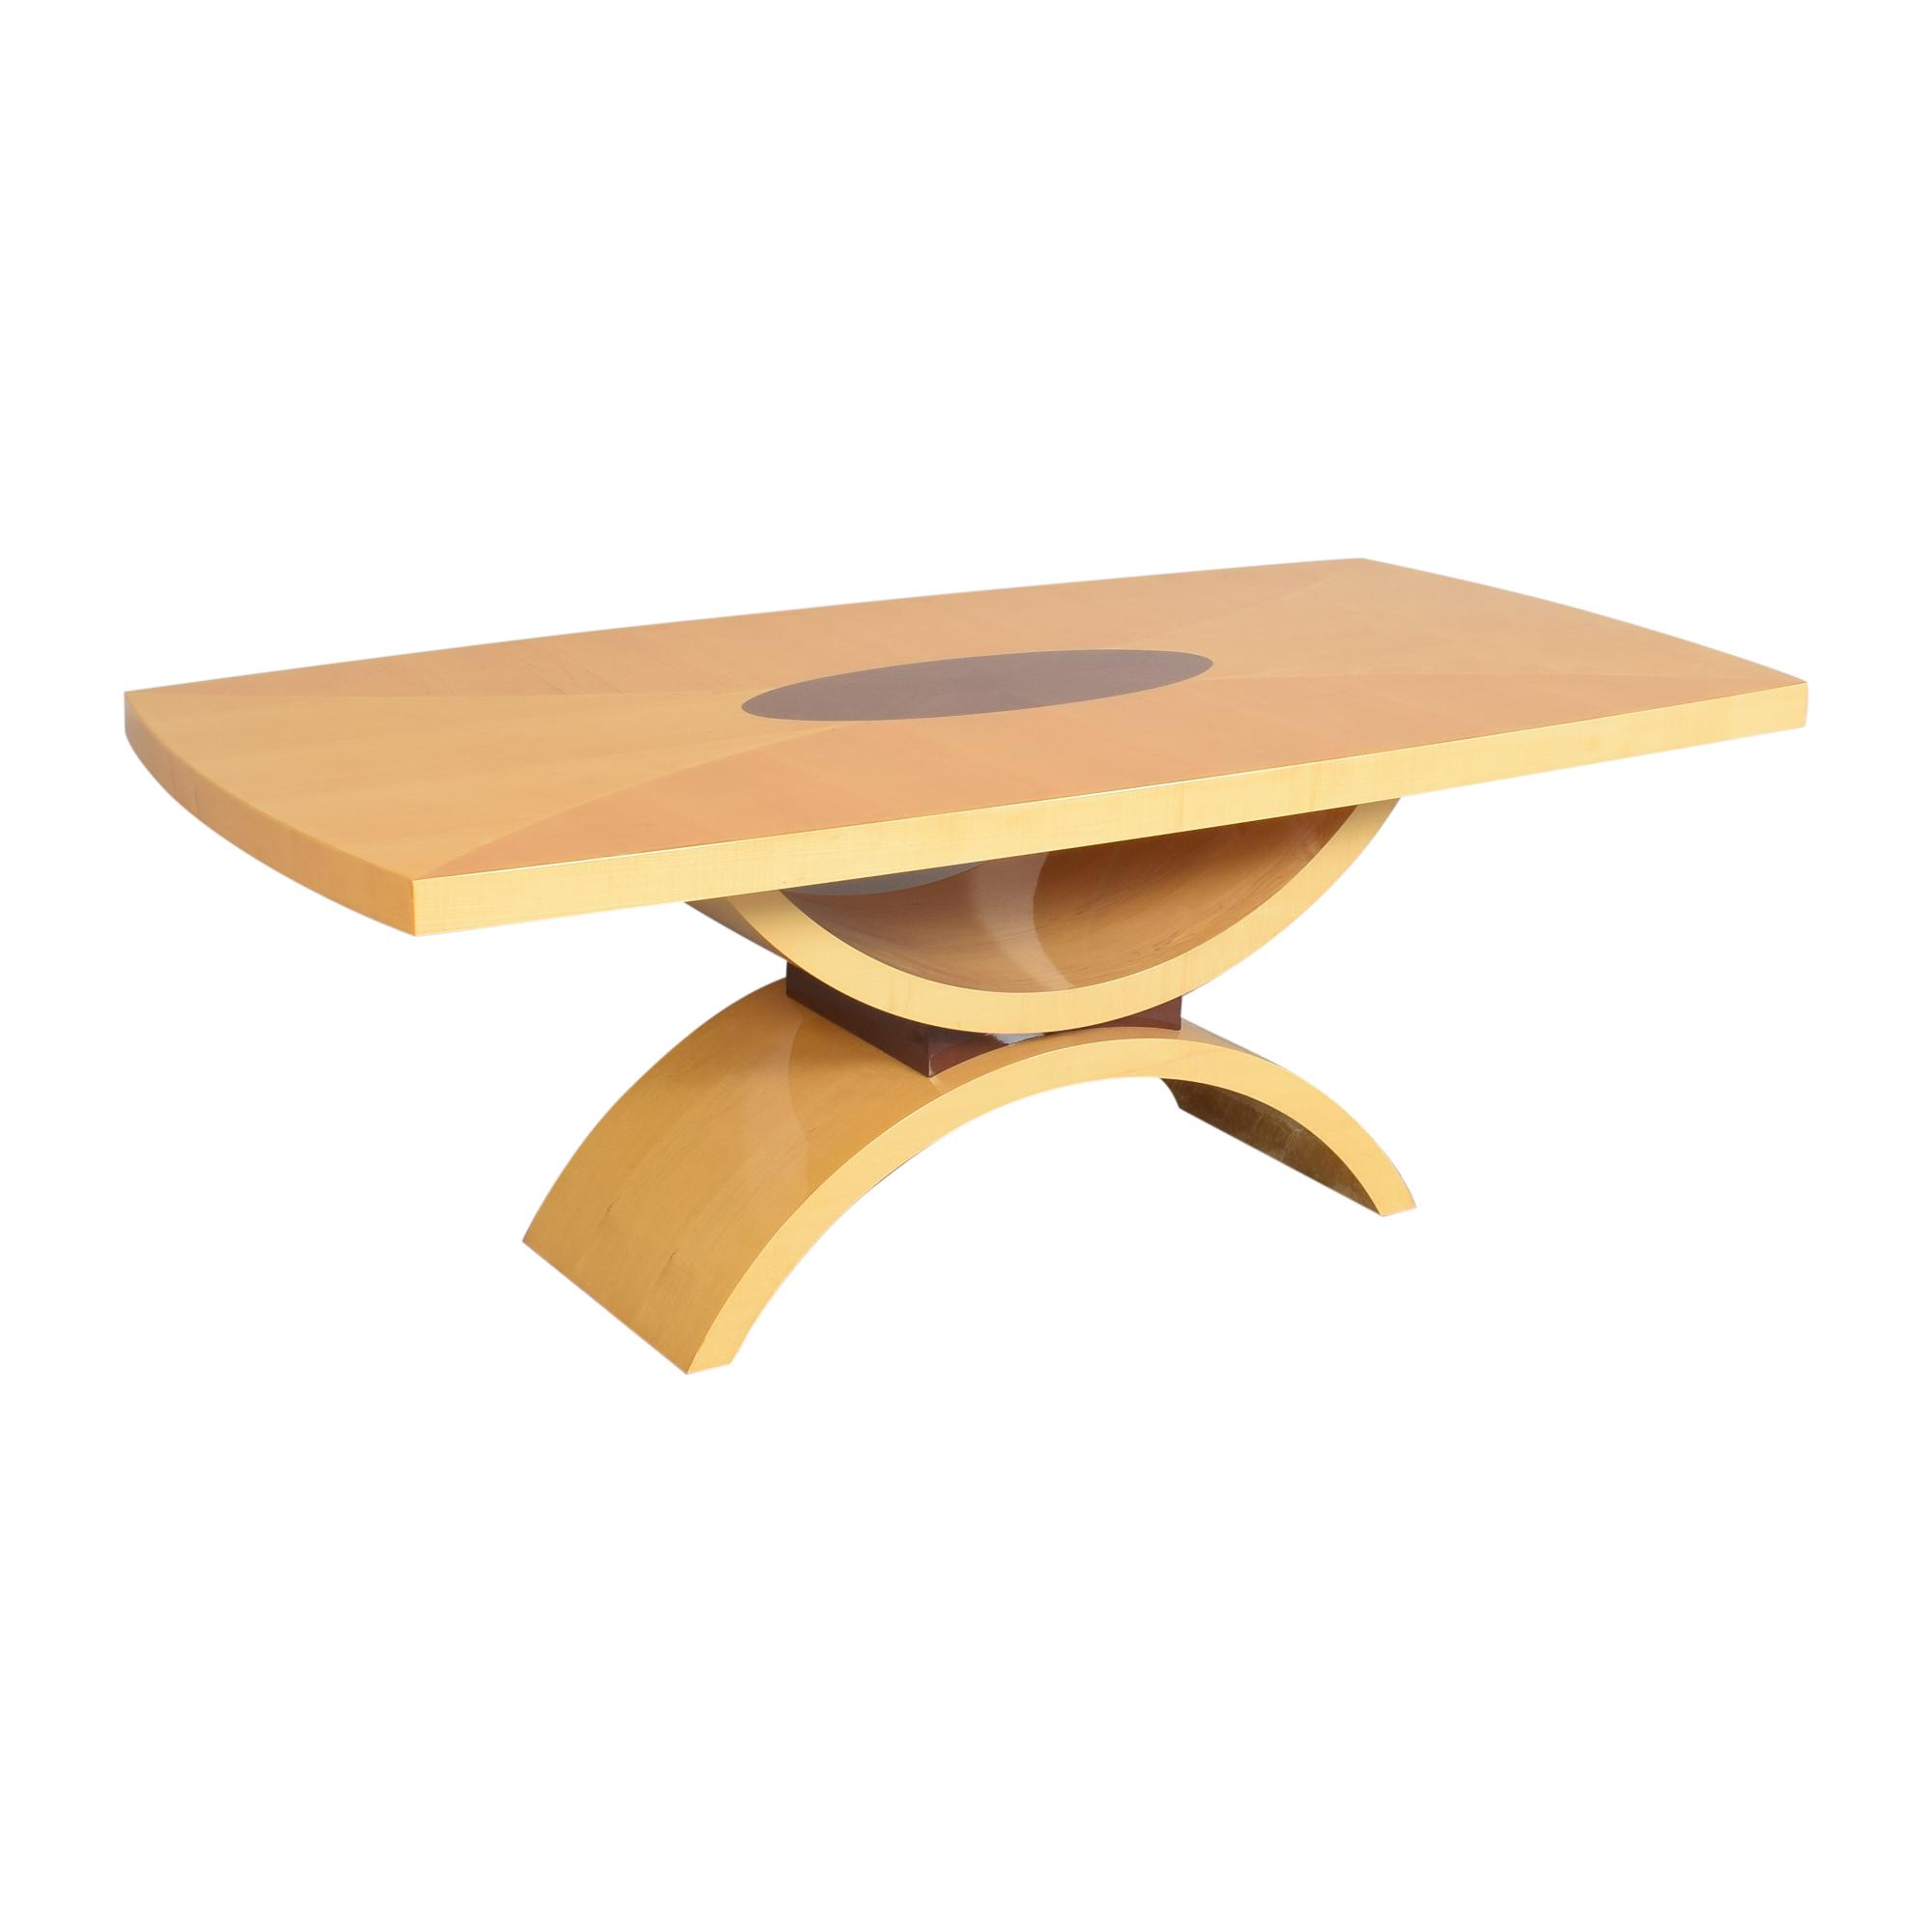 Pietro Costantini Pietro Costantini Extendable Dining Table